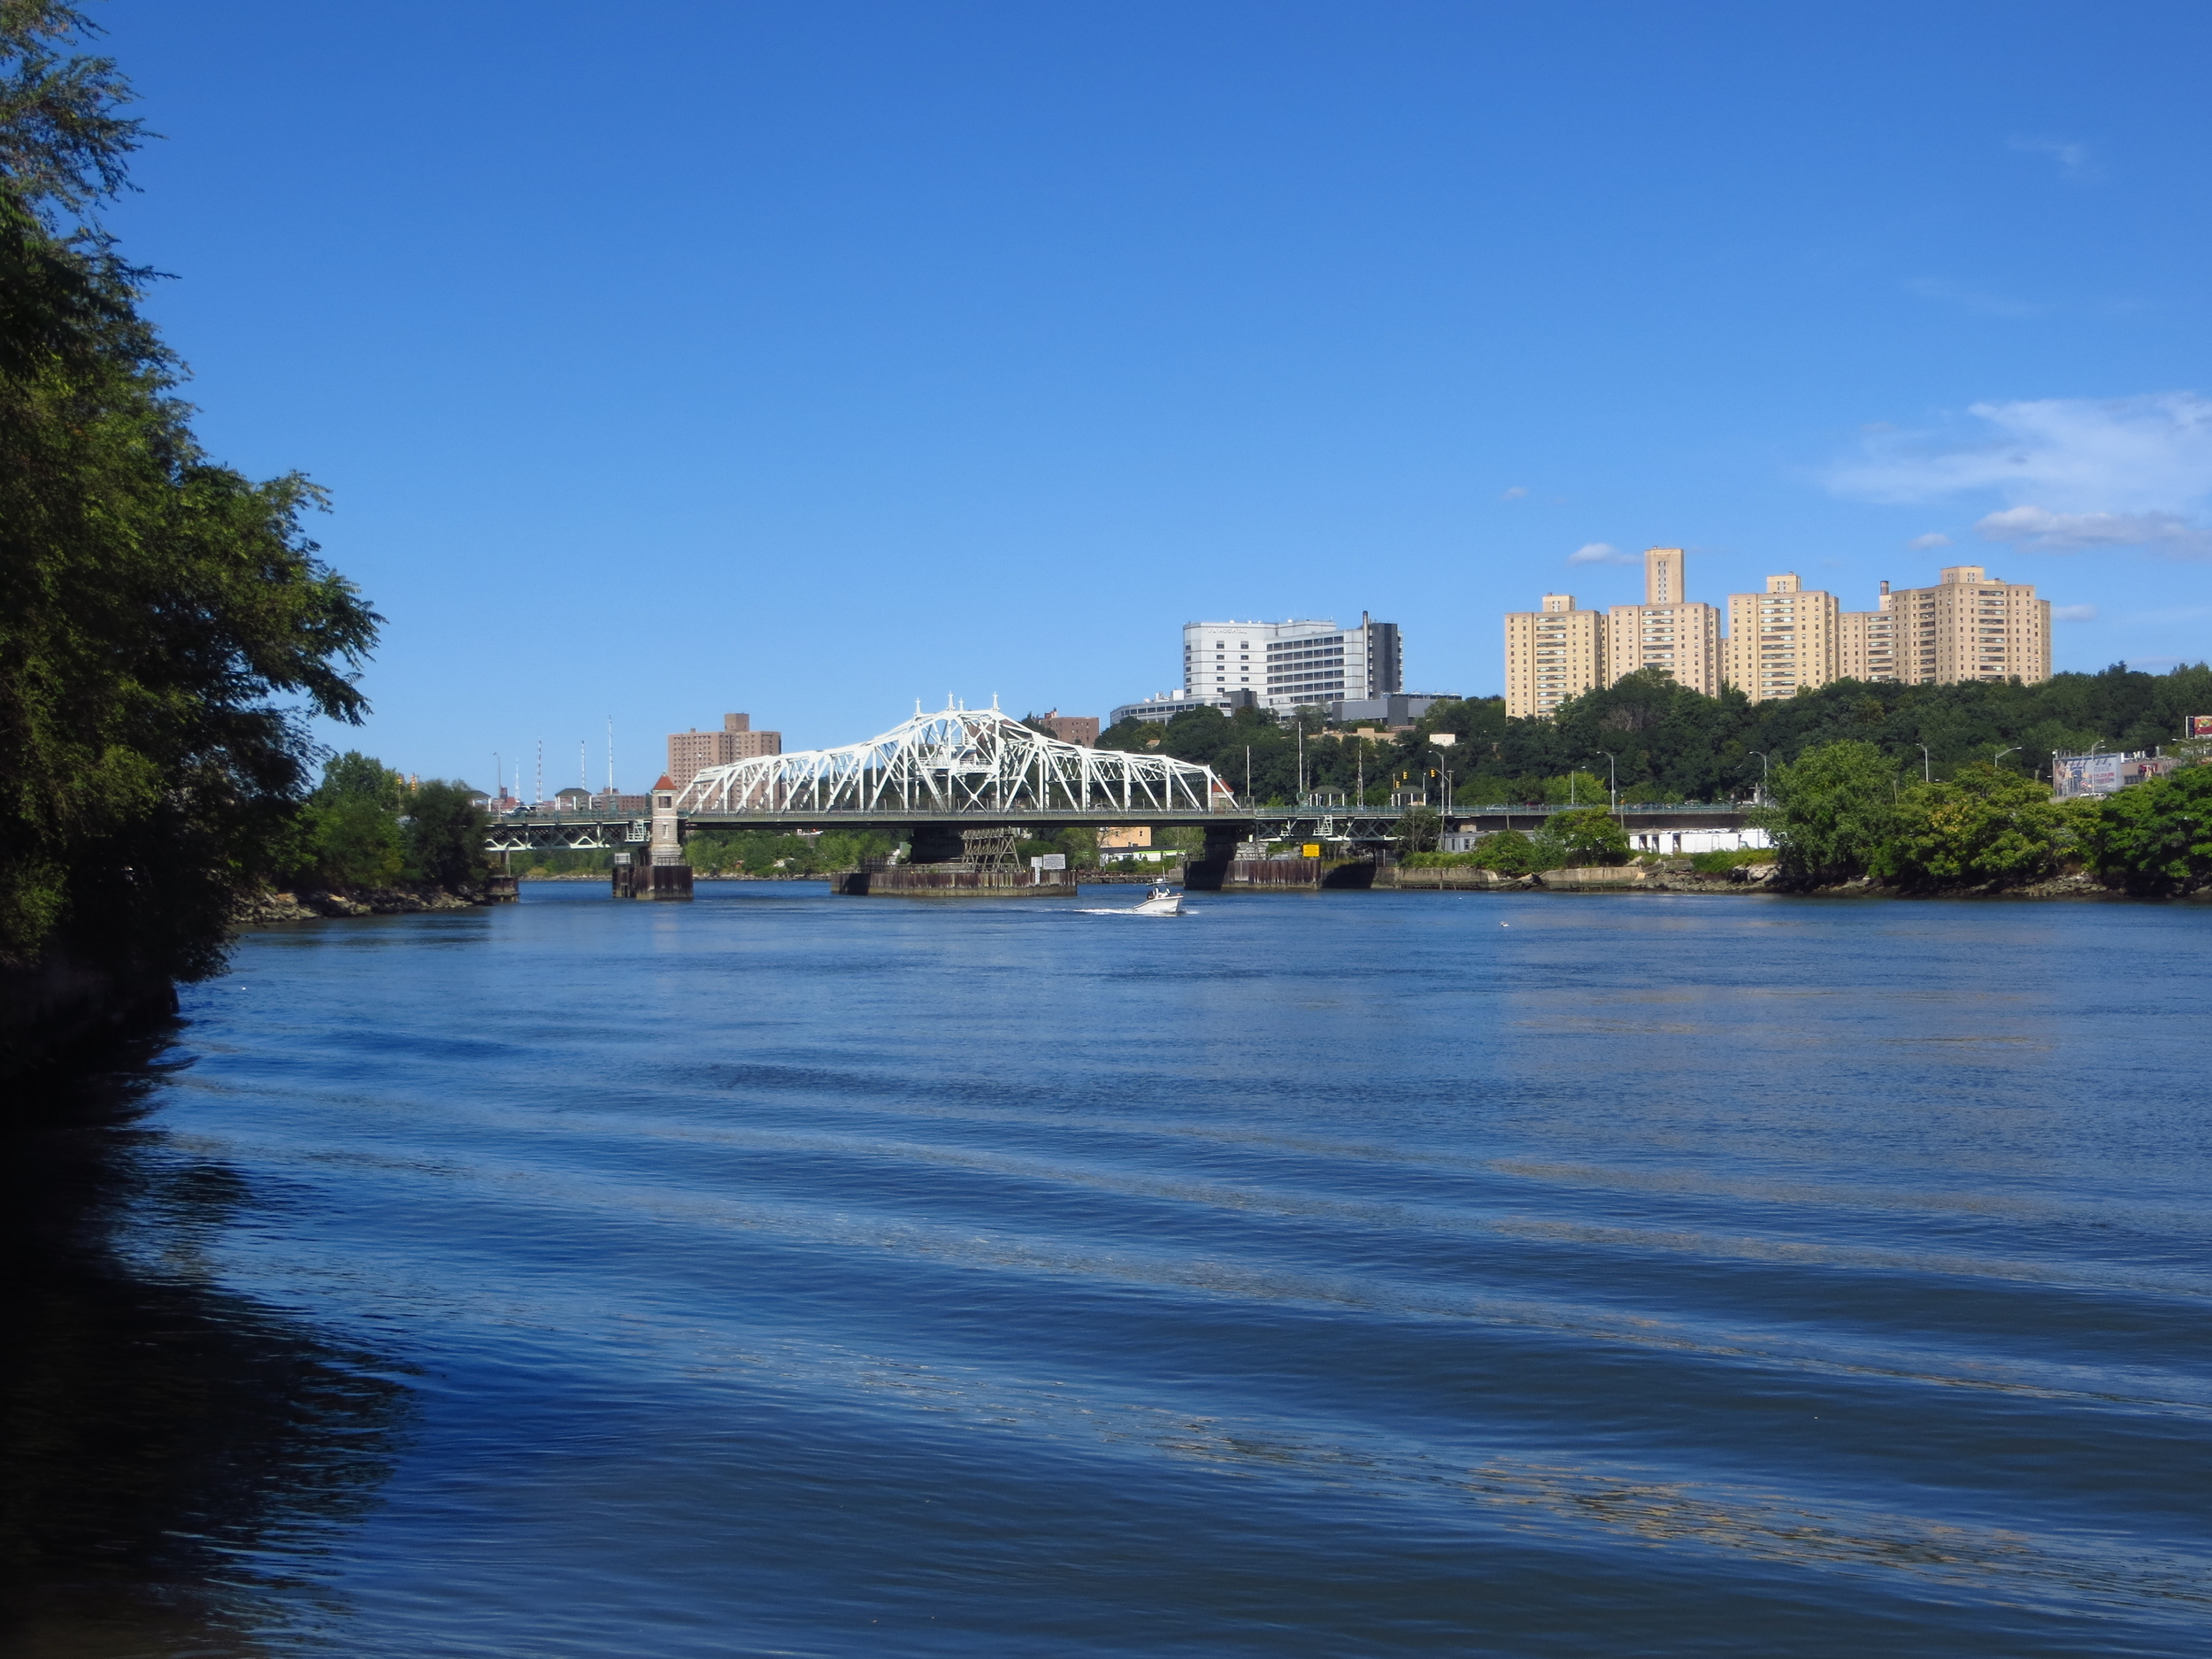 Harlem River and University Heights Bridge